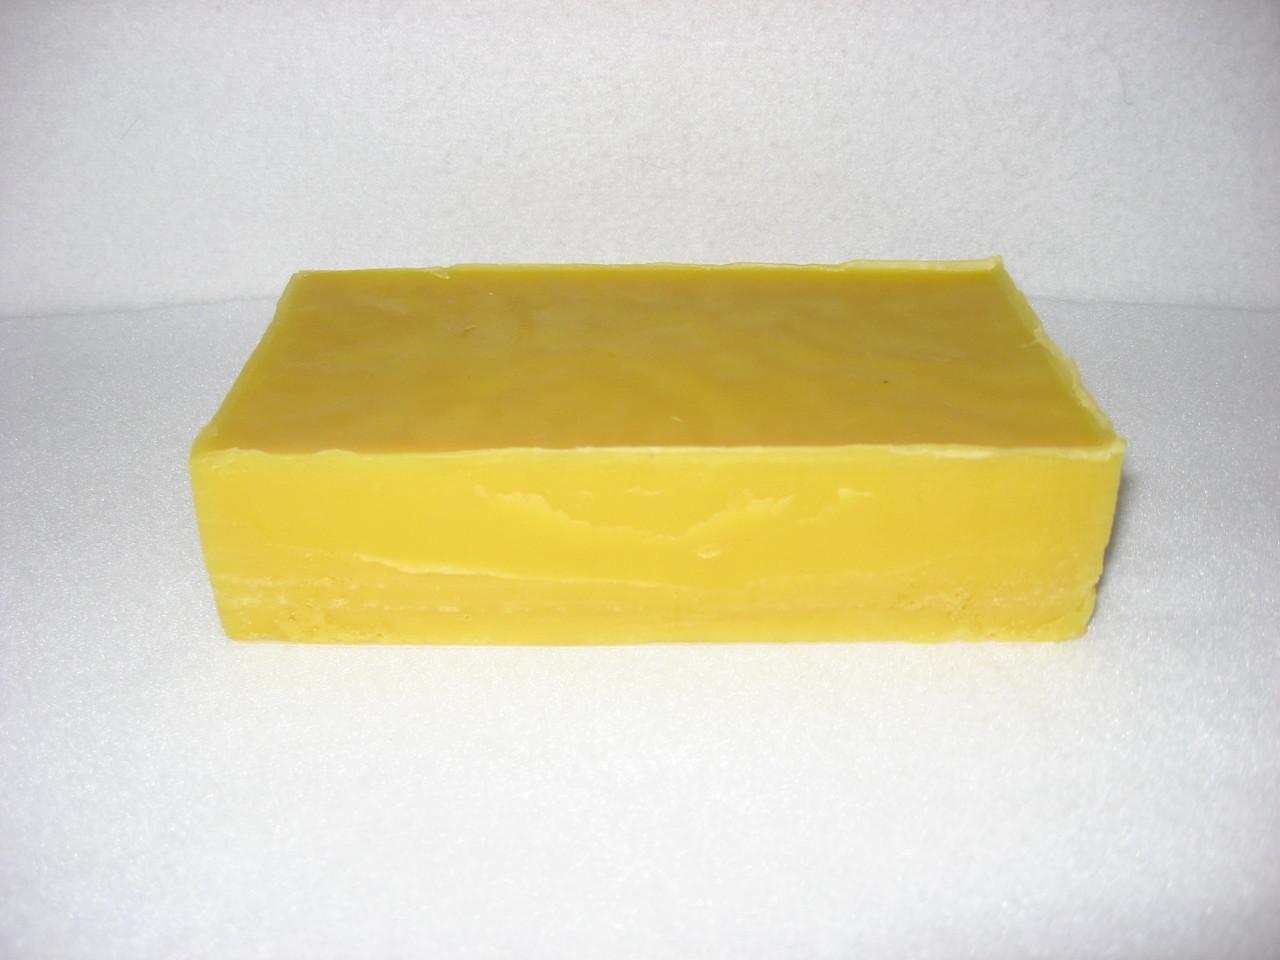 Pure beeswax - 1 lb. block